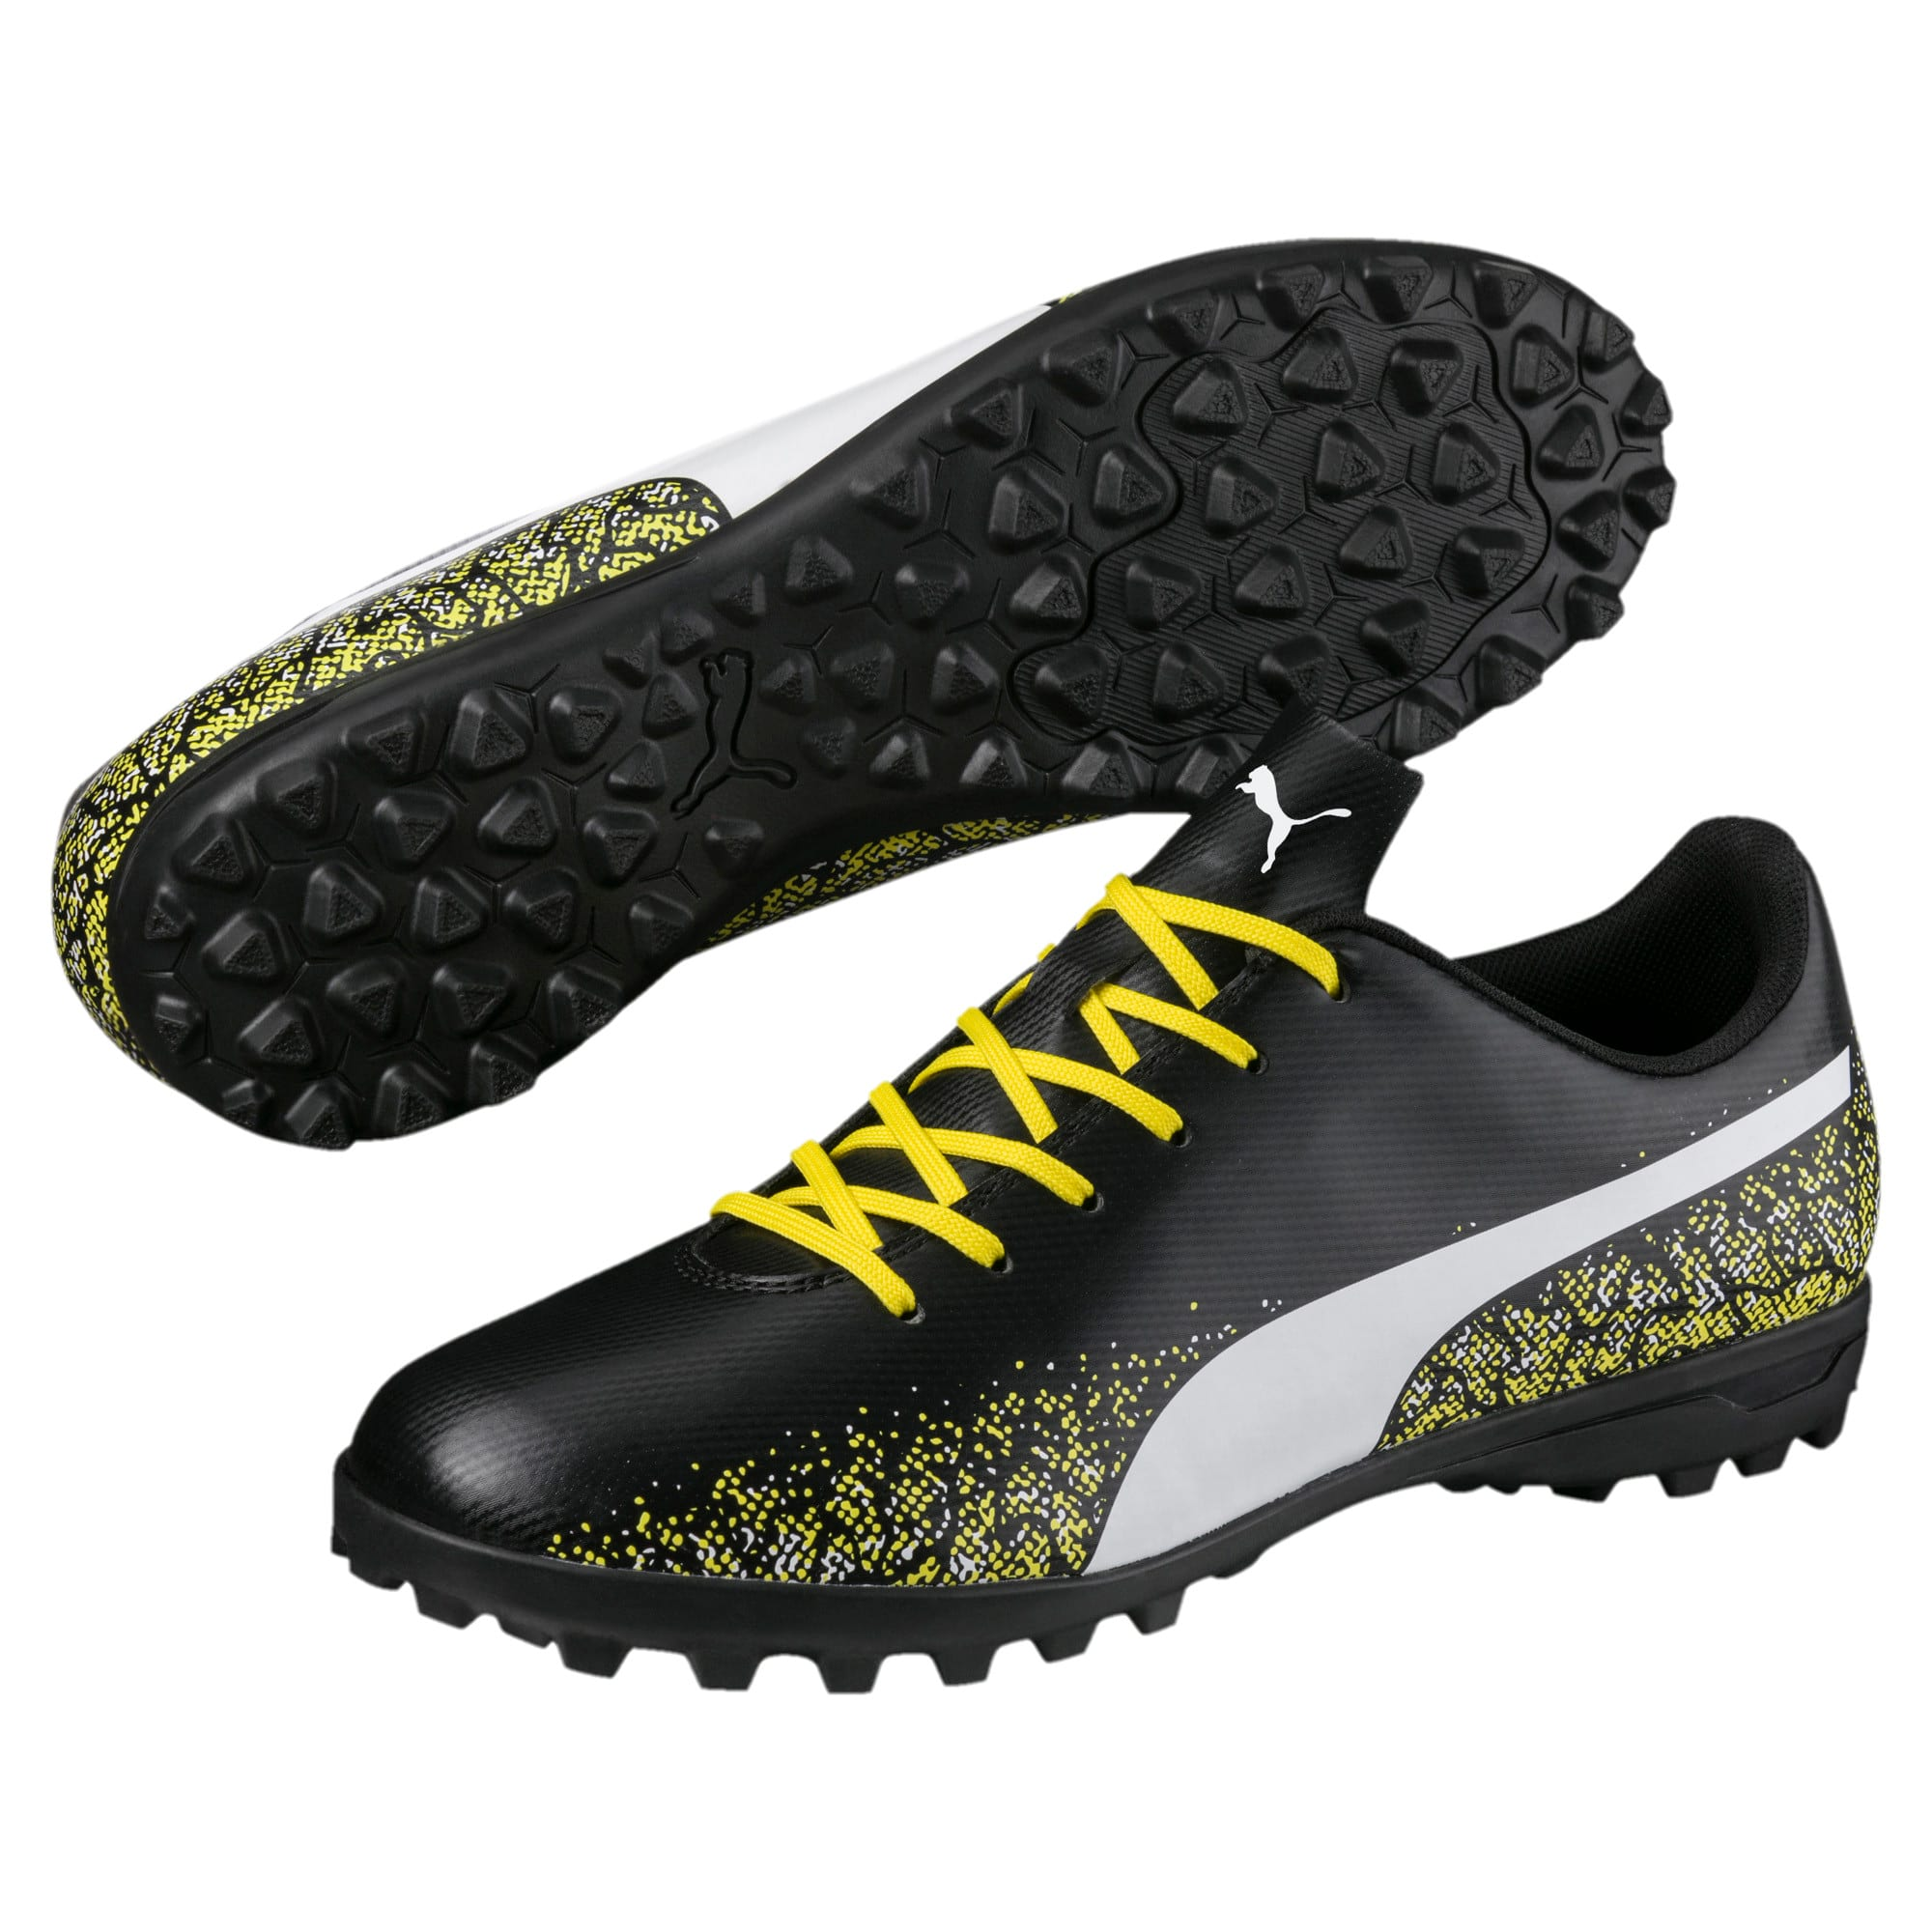 Thumbnail 2 of Truora TT Men's Football Boots, Black-White-Blazing Yellow, medium-IND